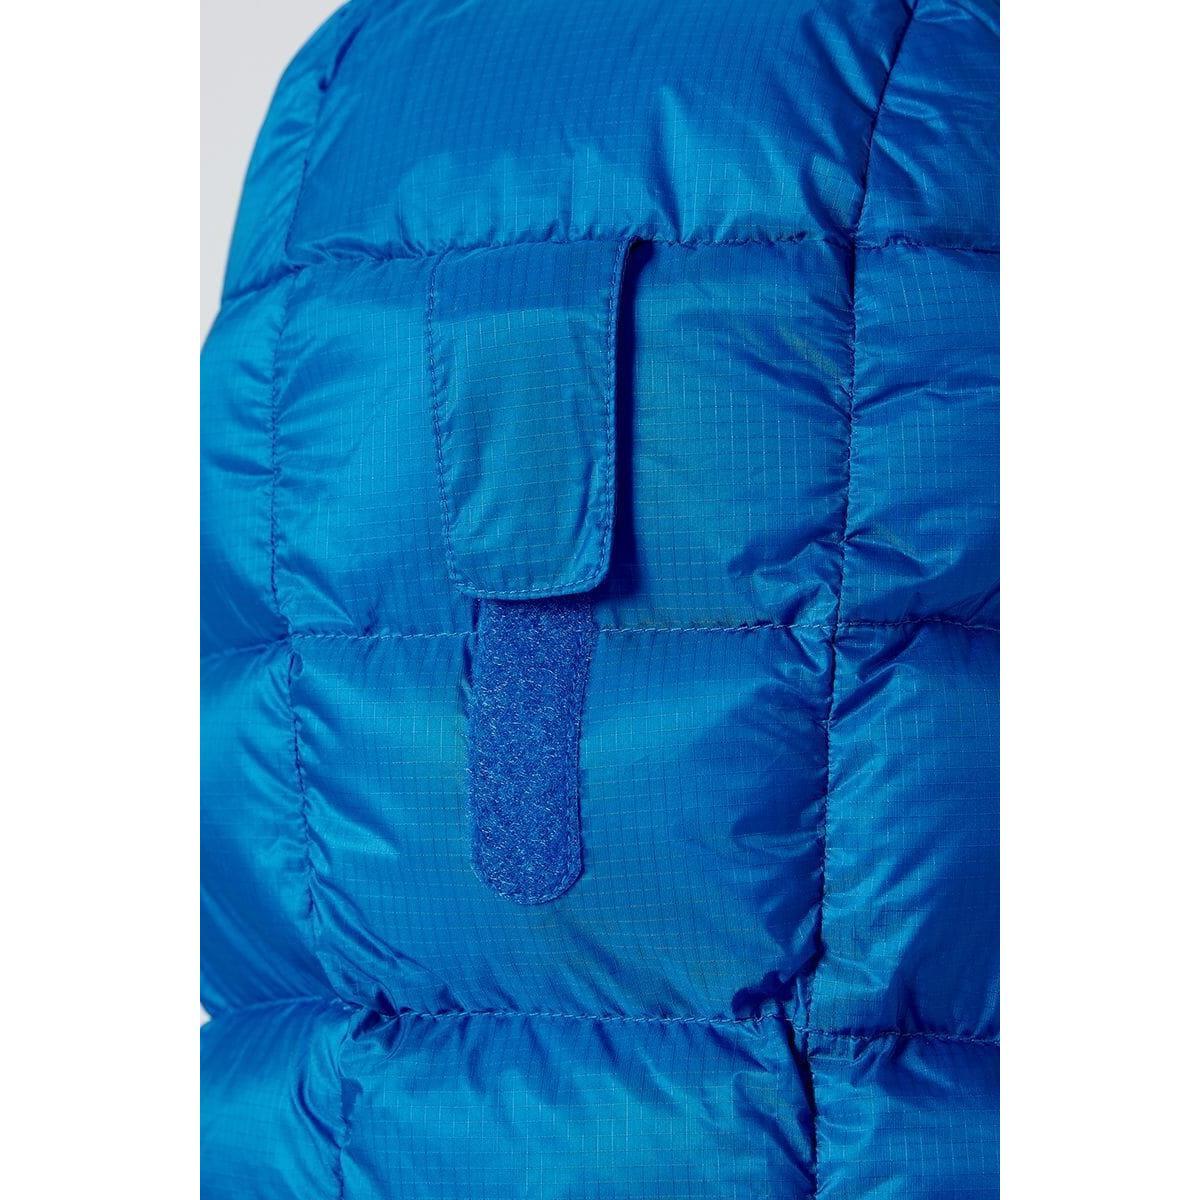 Rab Electron Pro Jacket - Polar Blue